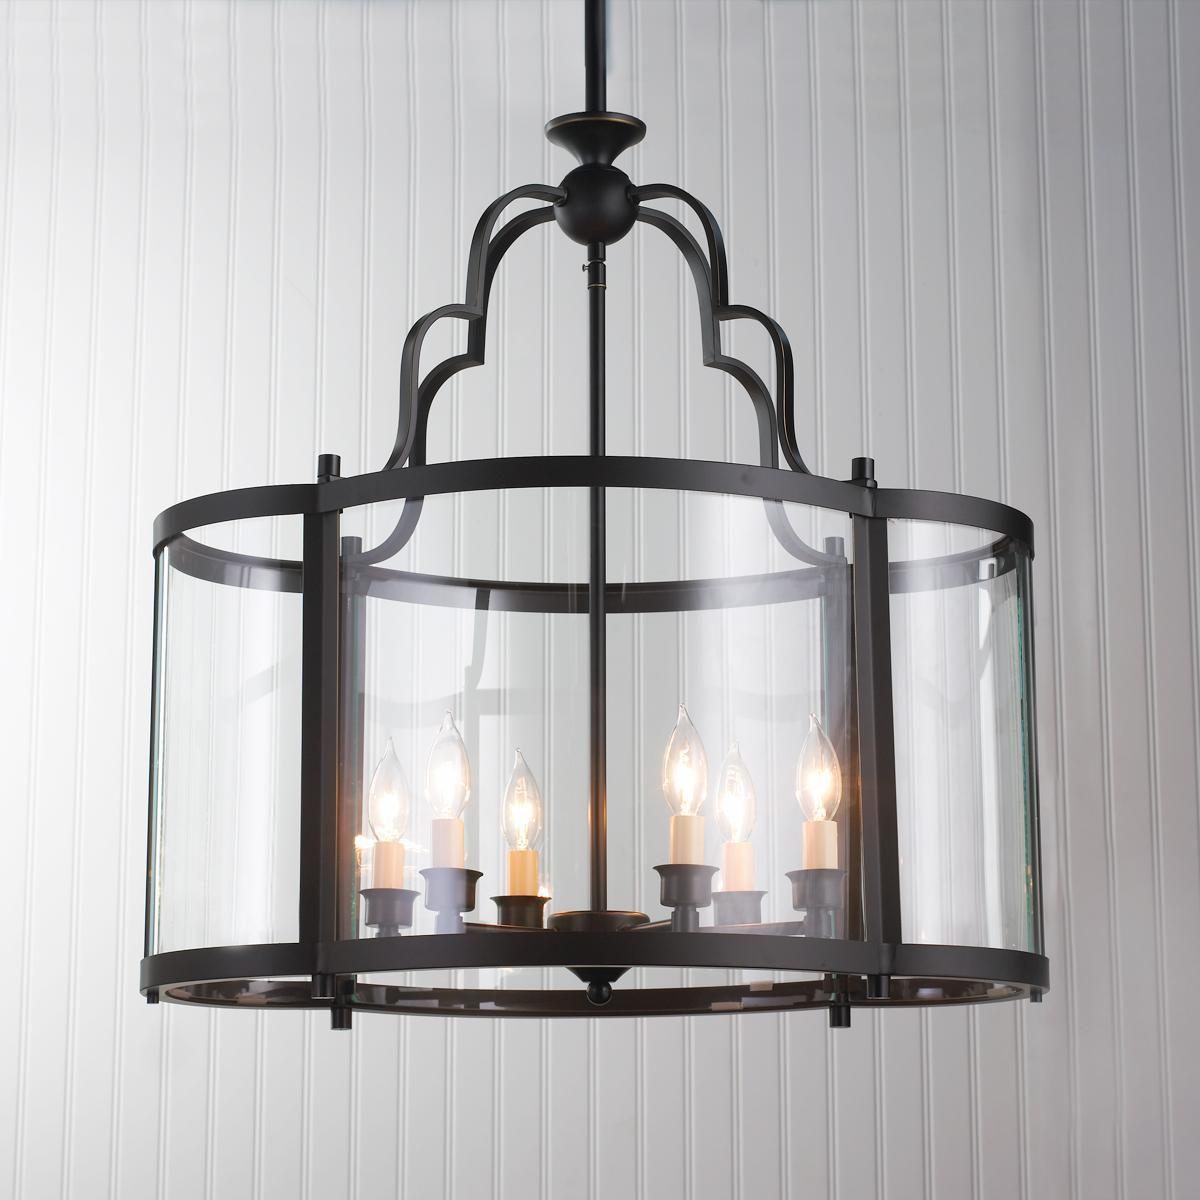 Strata art glass pendant light quatrefoil glass conservatory and oval quatrefoil lantern large mozeypictures Gallery